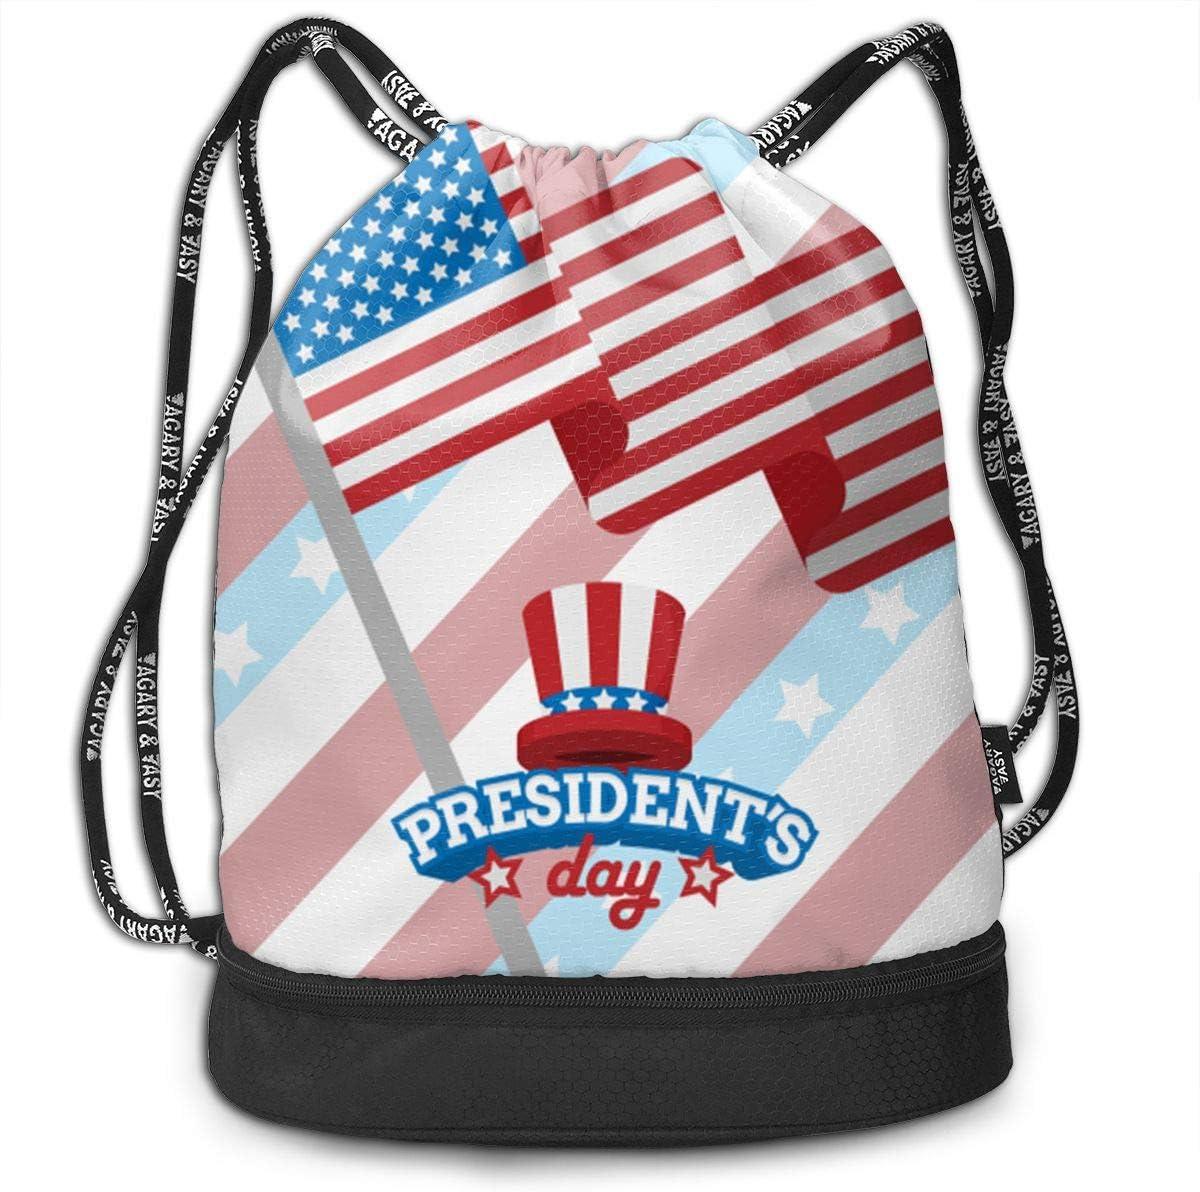 Zol1Q Lightweight Waterproof Large Storage Drawstring Bag for Men /& Women Presidents Day Cinch Backpack Sackpack Tote Sack